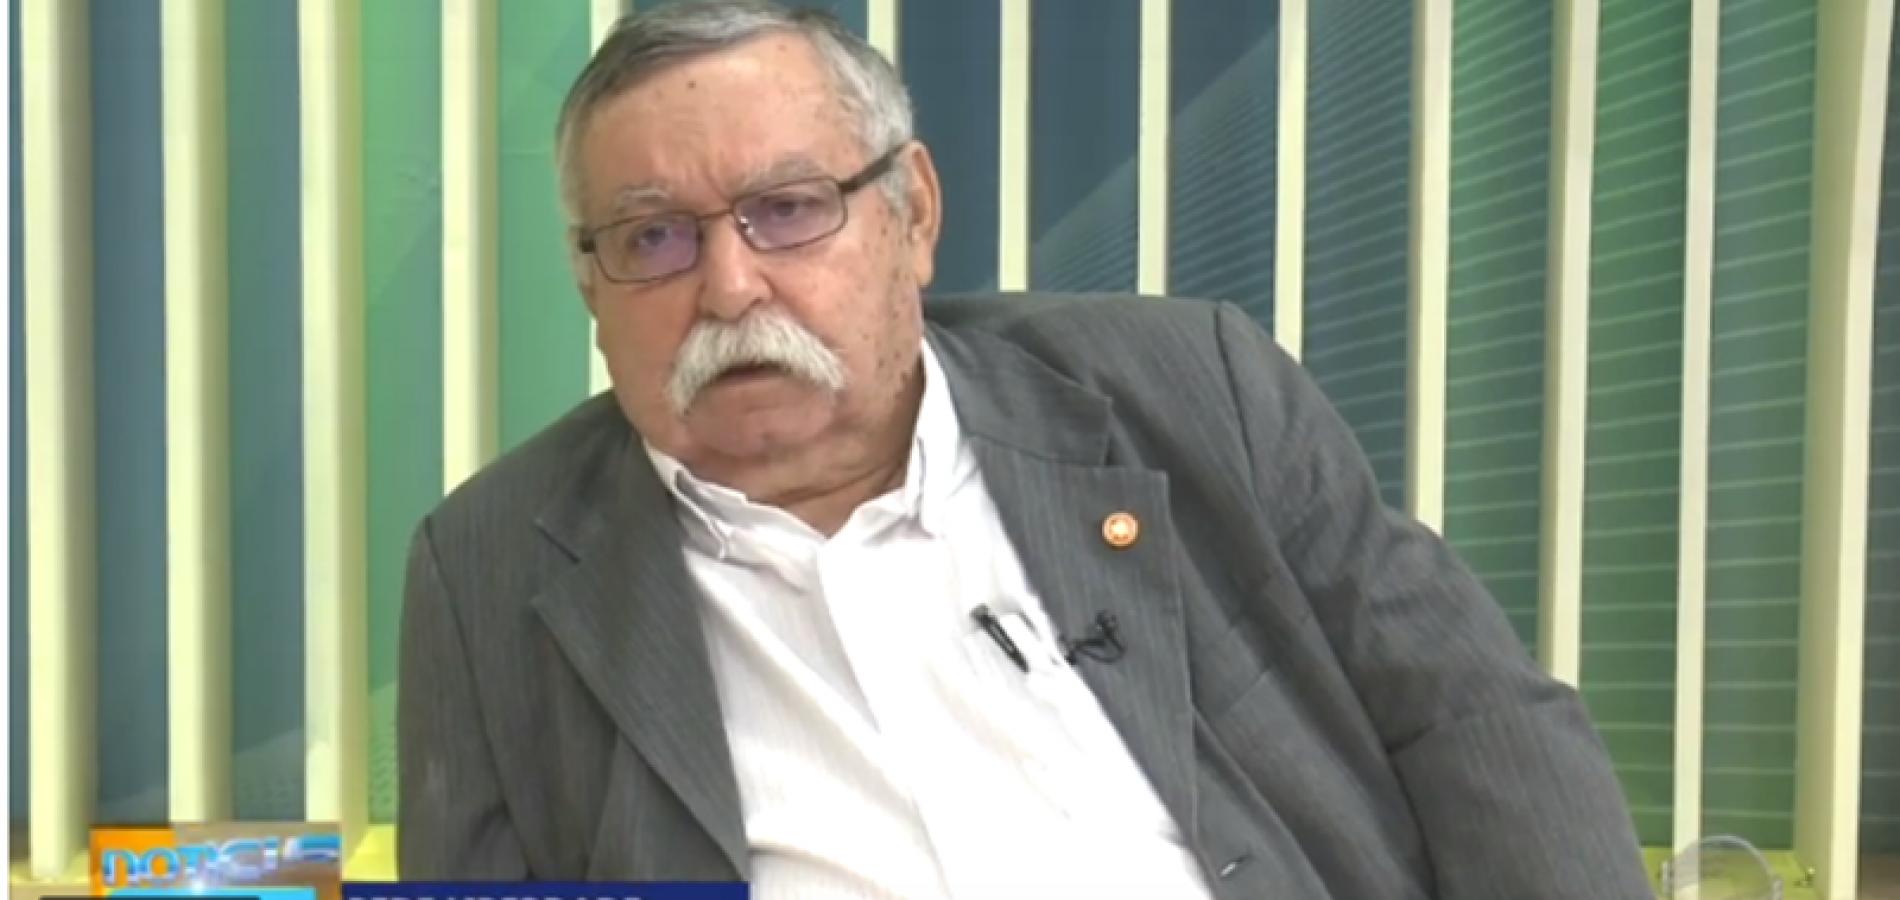 Promotor diz que soltura de Pablo Santos seria ato de desumanidade